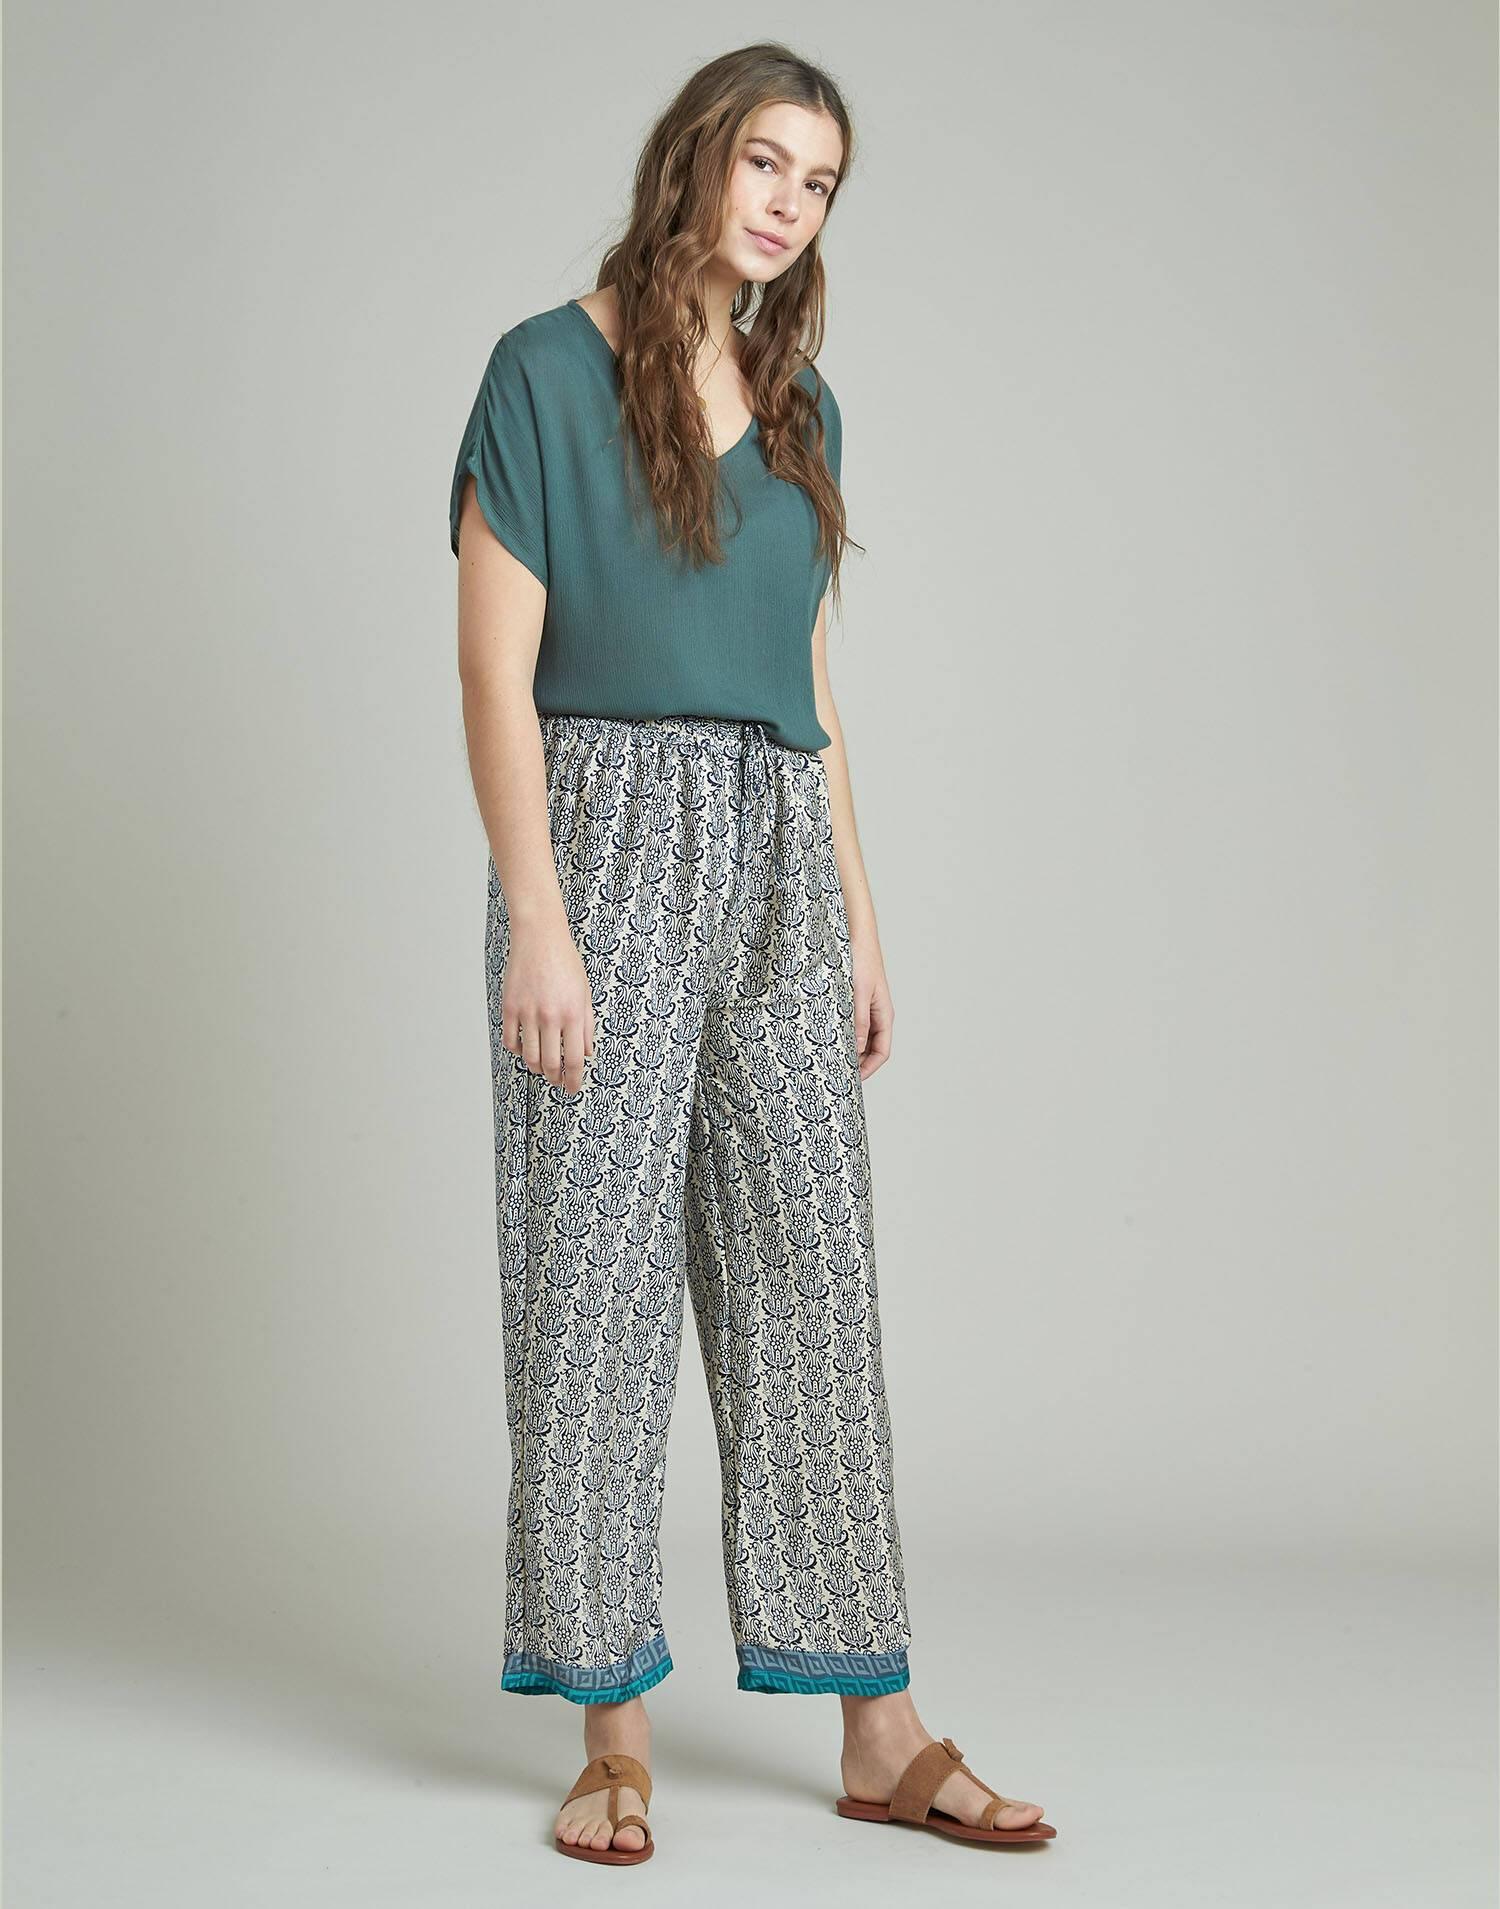 Pantalón largo cordón seda